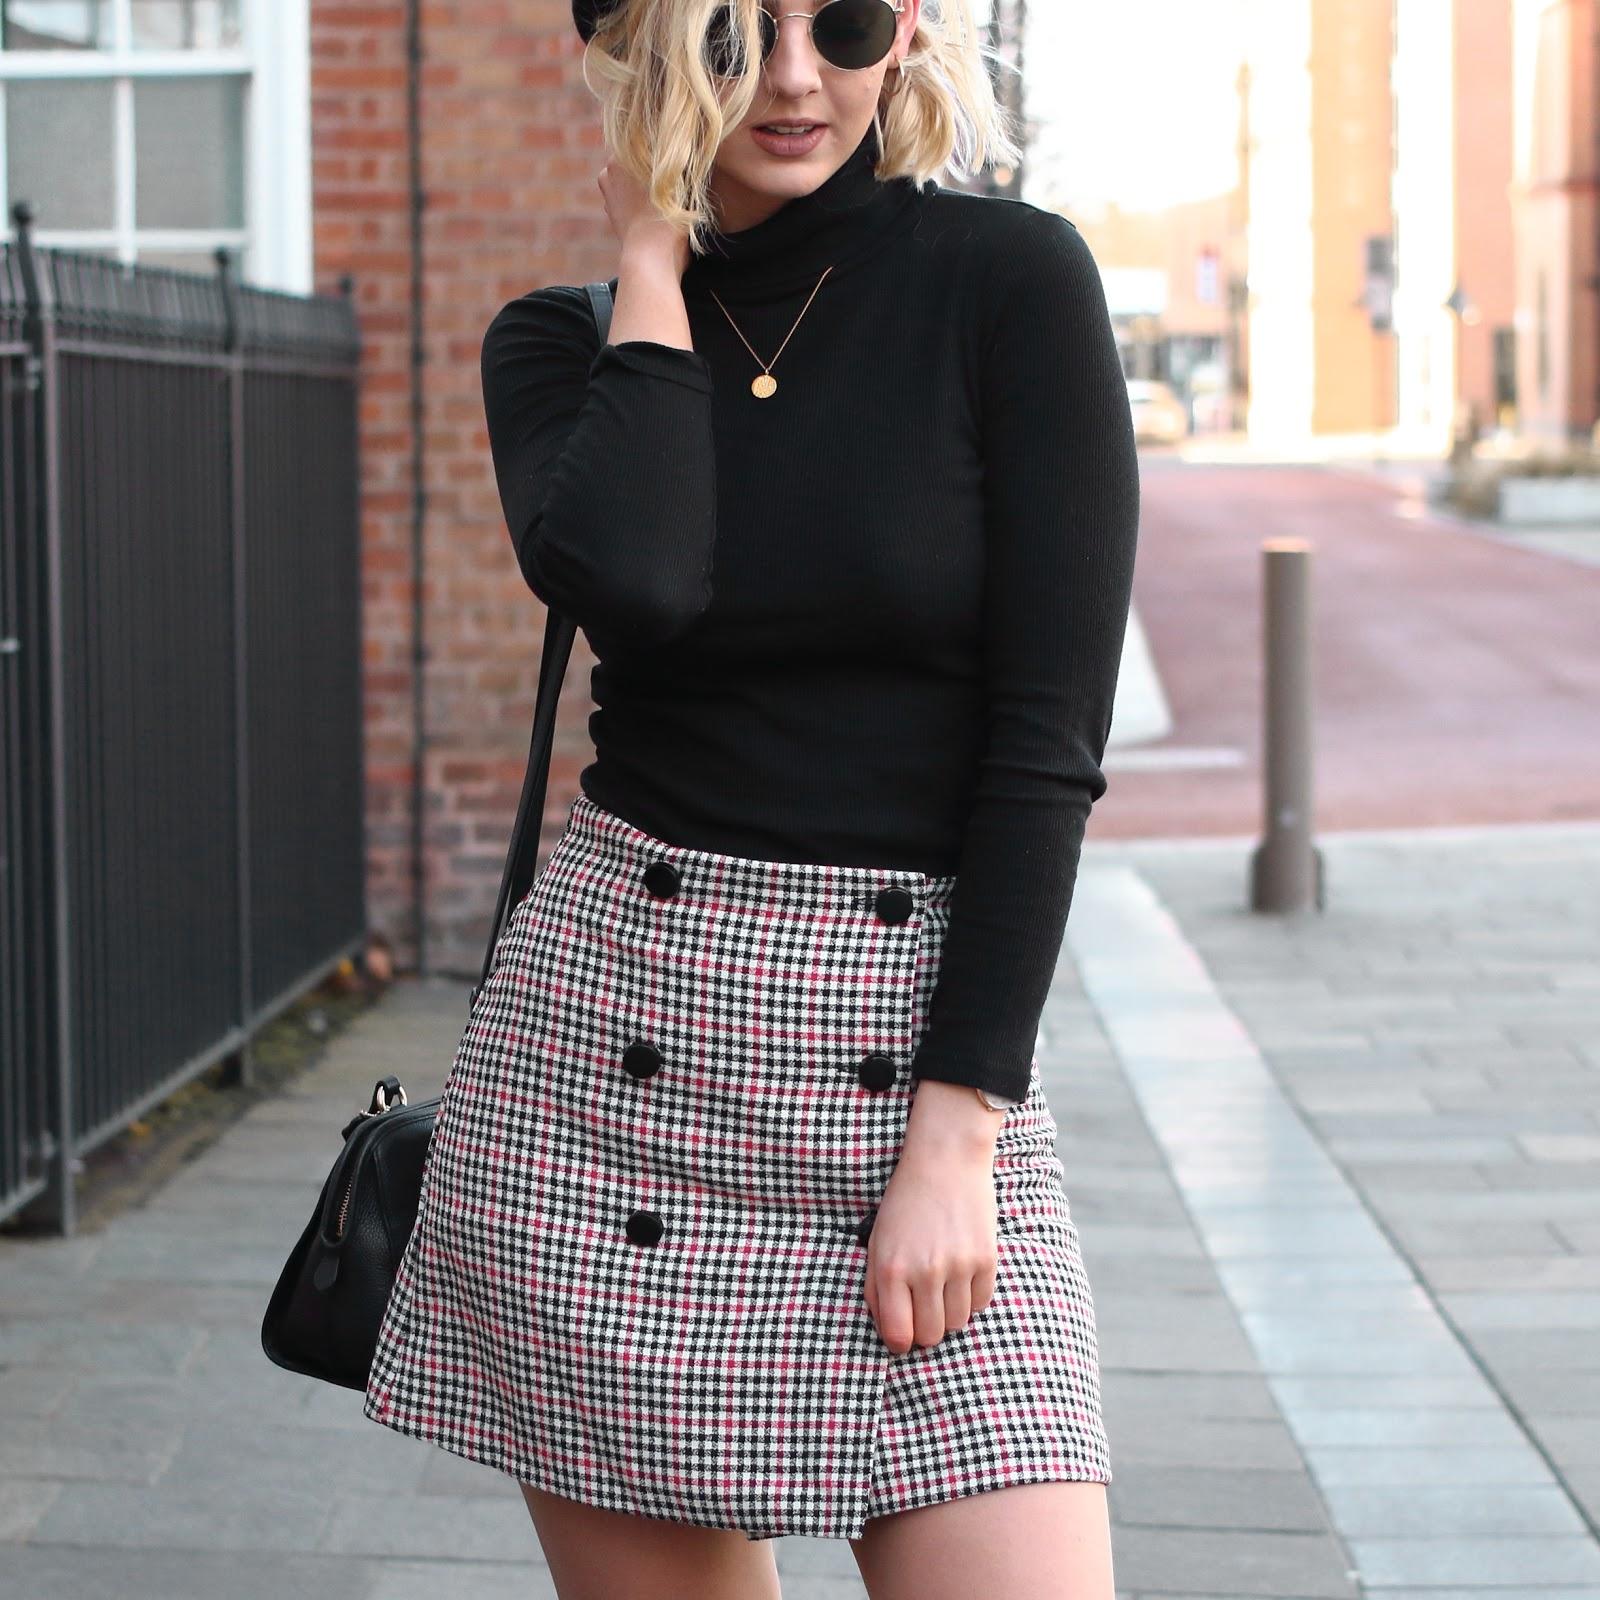 Asos, check, skirt, tartan, pattern, ootd, blogger, uk, fashion, black, polo, neck, jumper, beret, styling